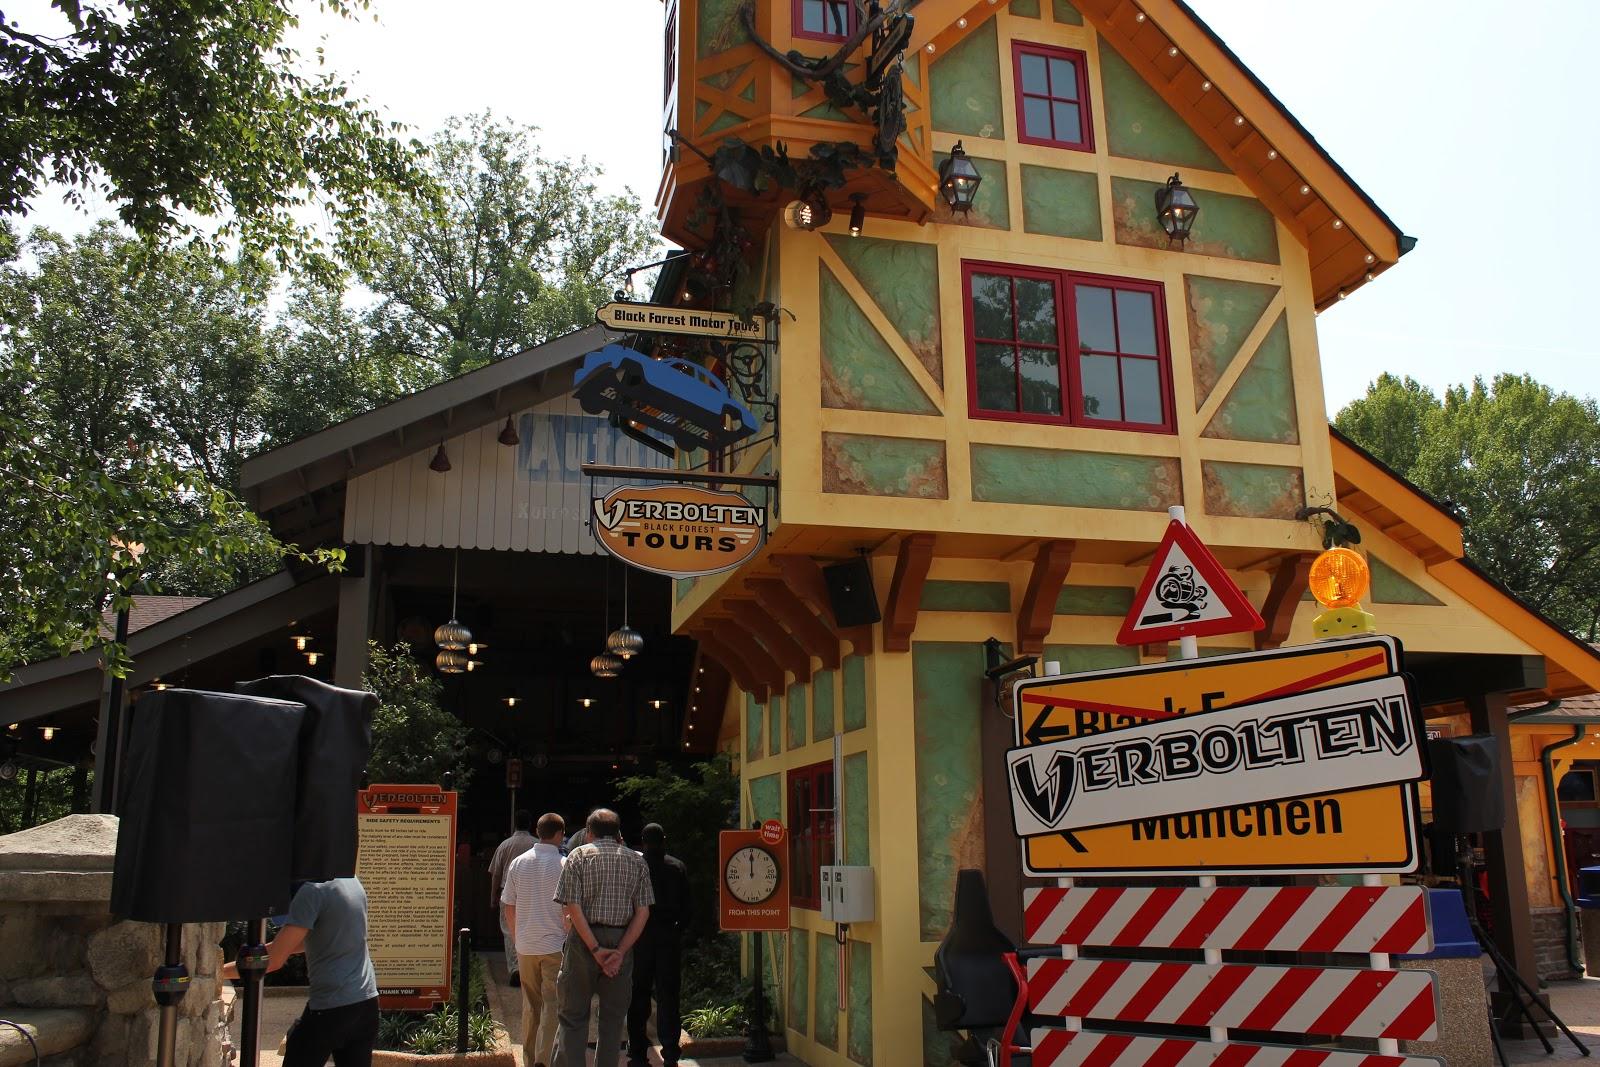 High Quality Ride Review   Verbolten At Busch Gardens Williamsburg